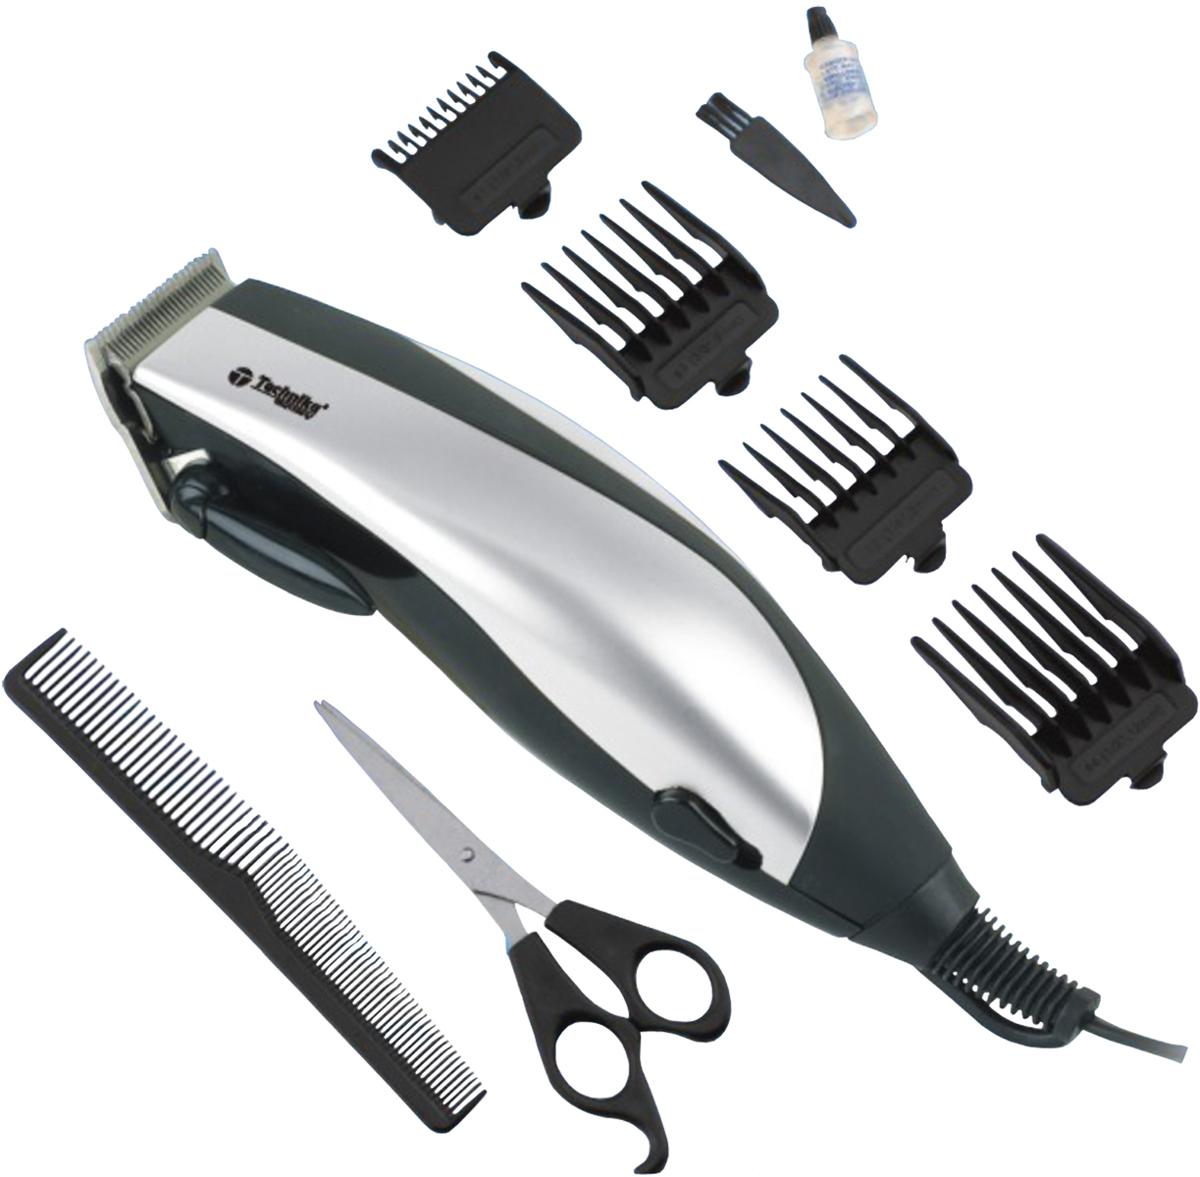 Technika TK-615 В, Silver машинка для стрижки машинка для стрижки волос technika tk 615c